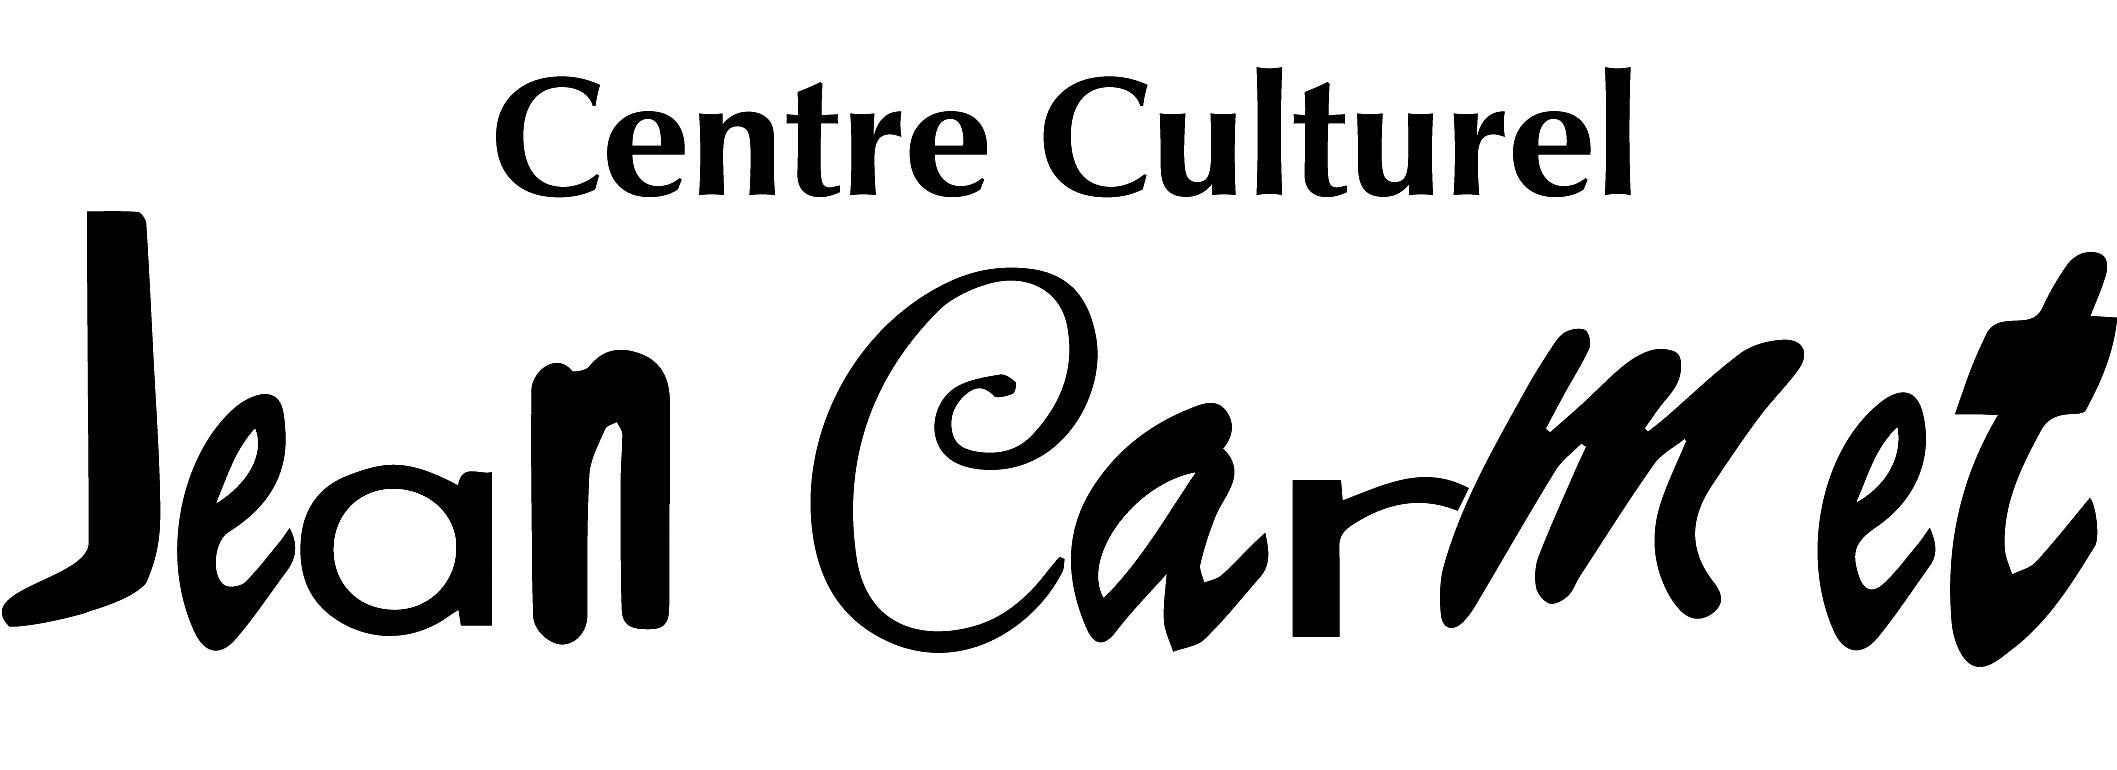 Lulla programmation Centre culturel Jean Carmet